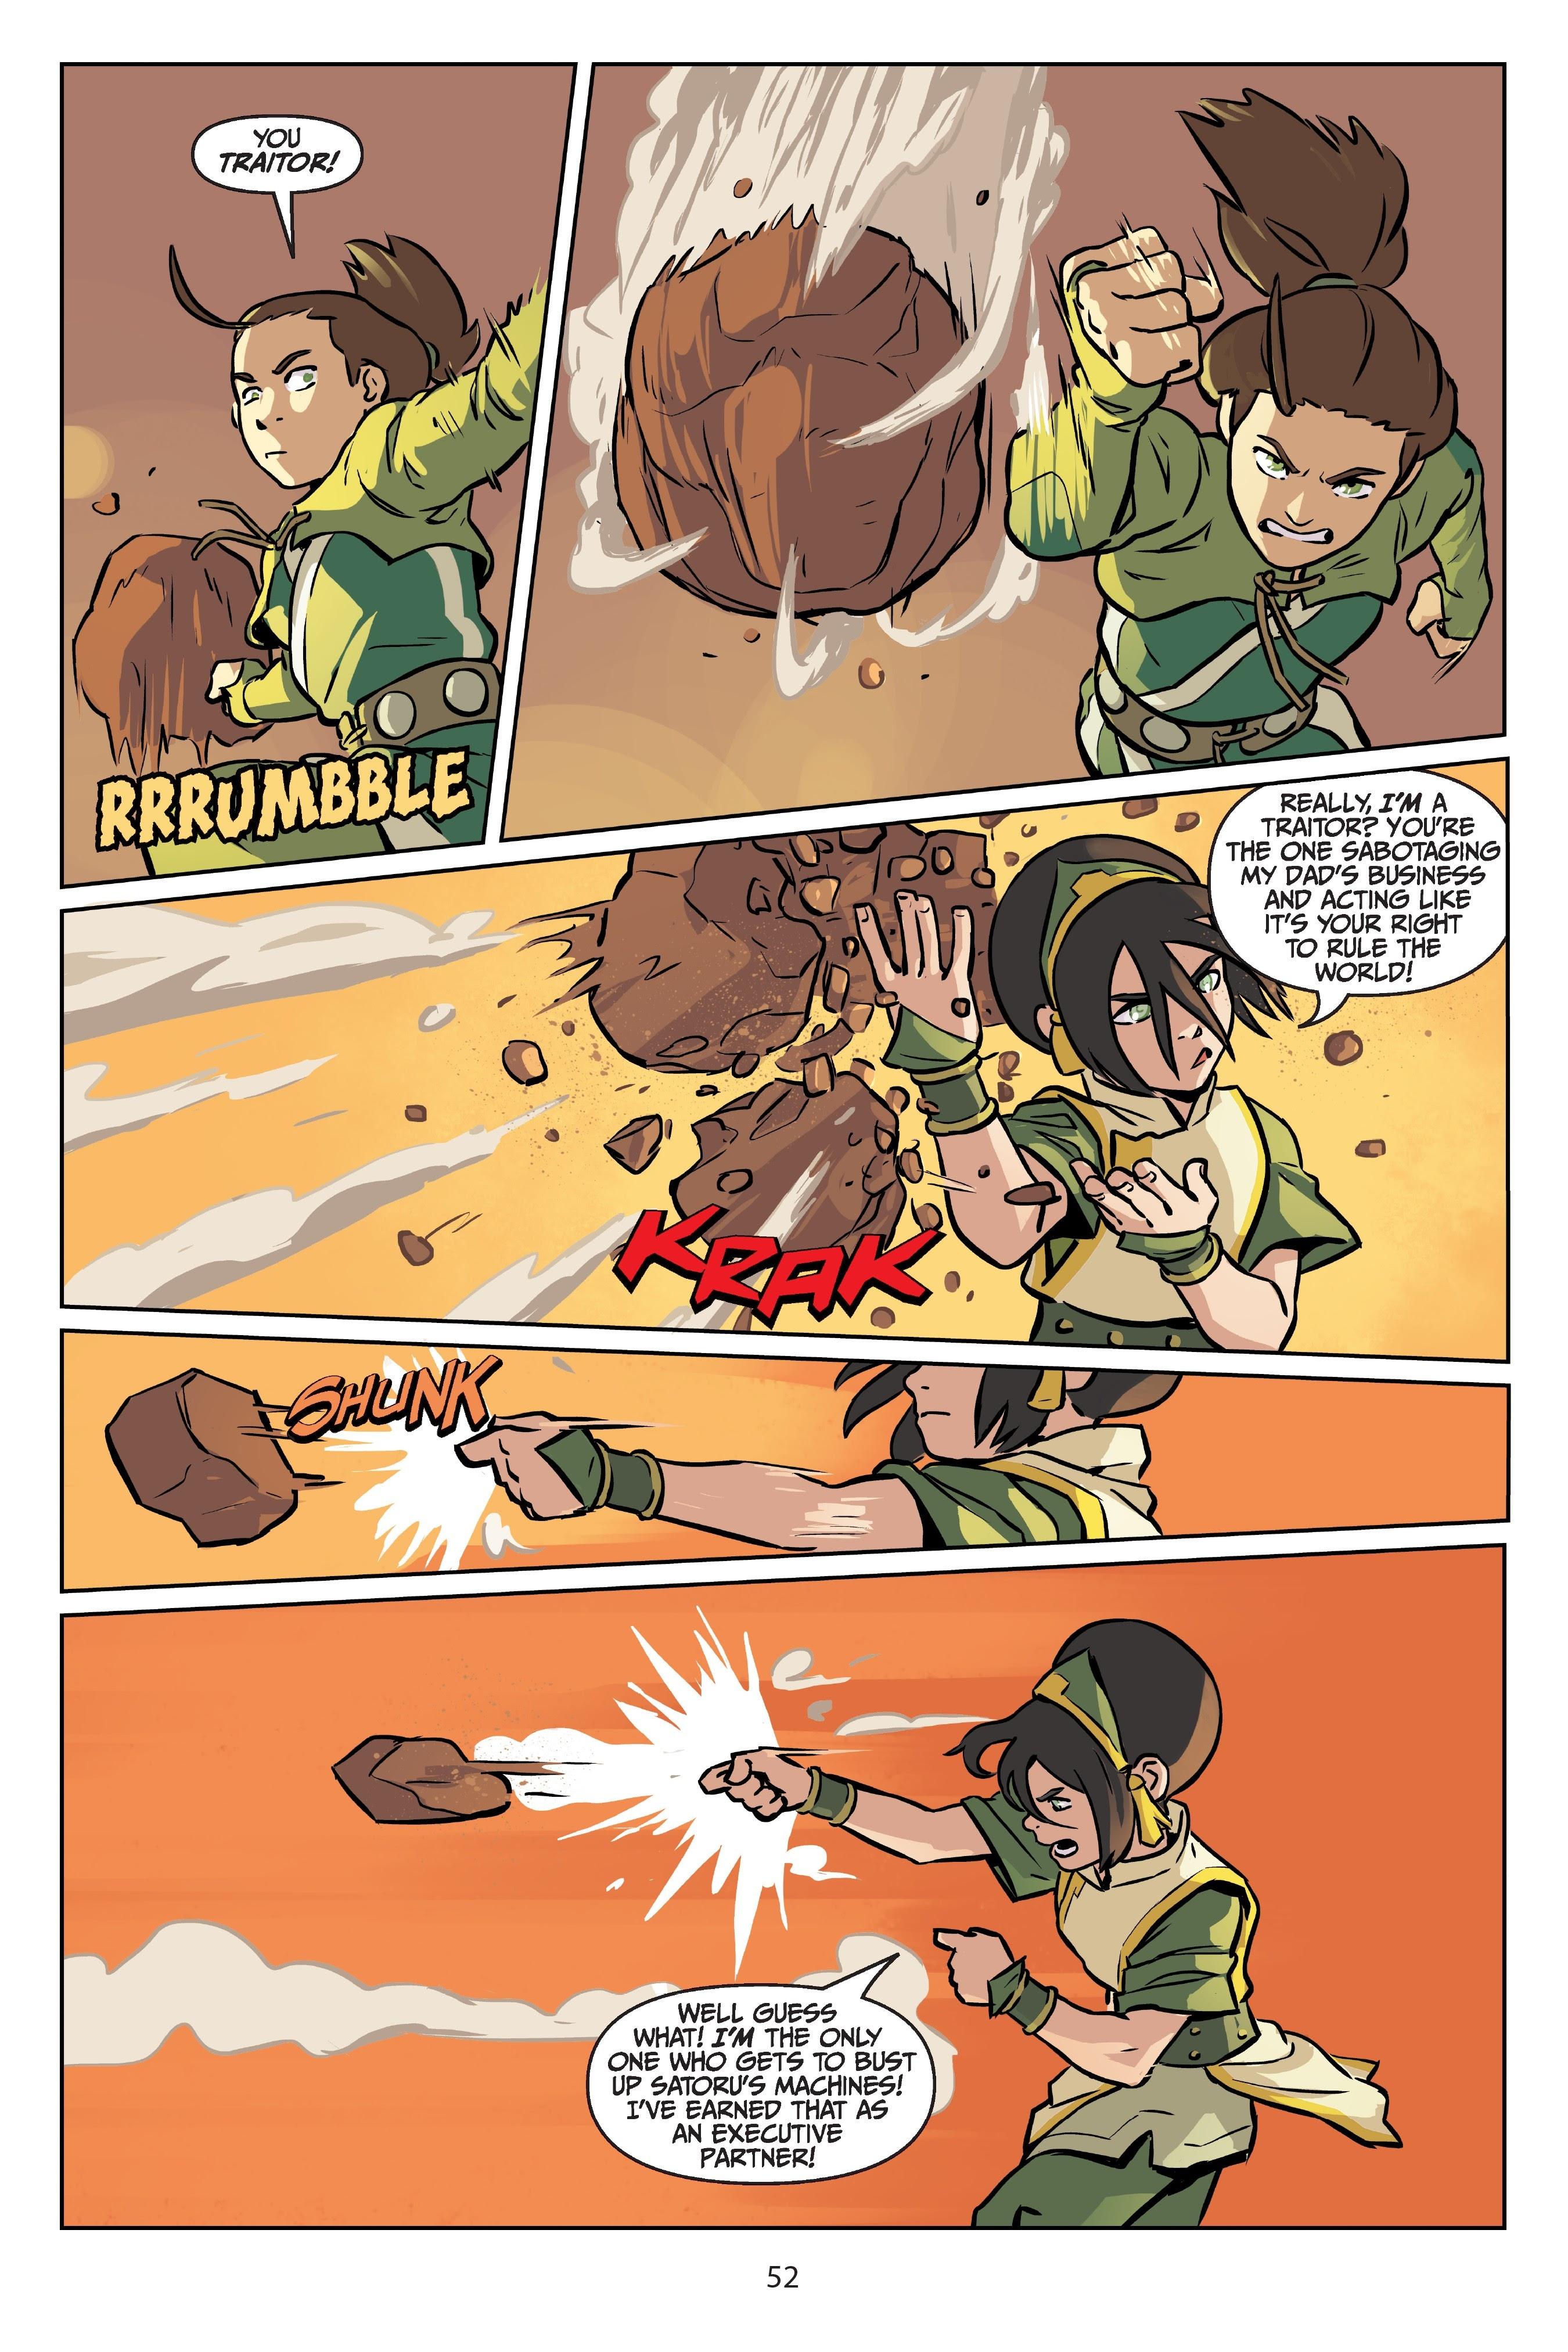 Nickelodeon Avatar: The Last Airbender - Imbalance TPB_2 Page 52